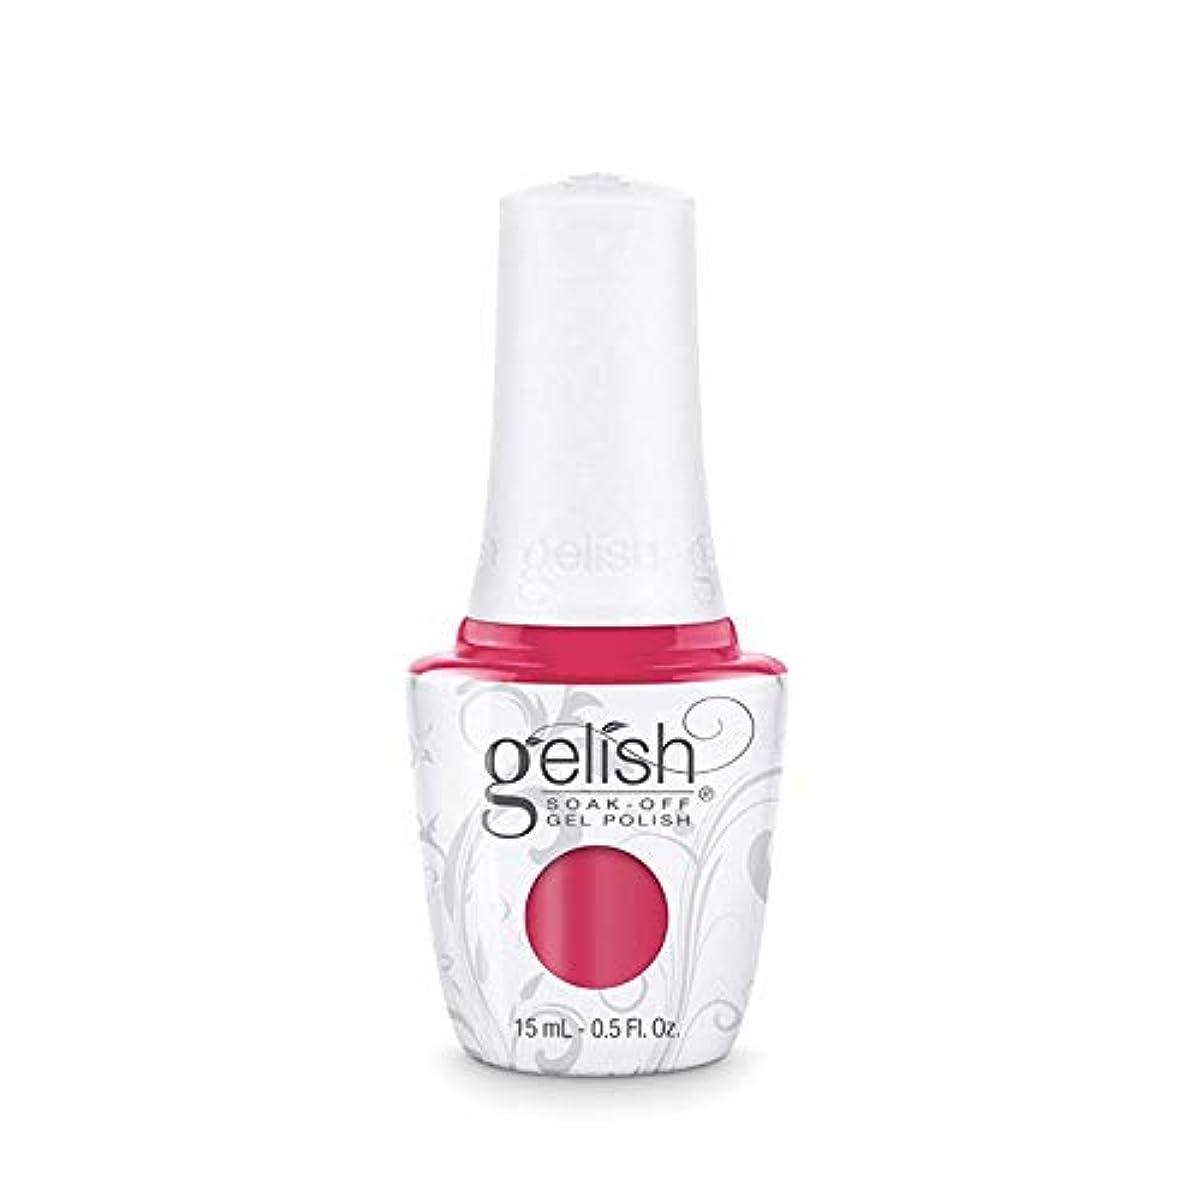 Harmony Gelish - Prettier In Pink - 0.5oz / 15ml